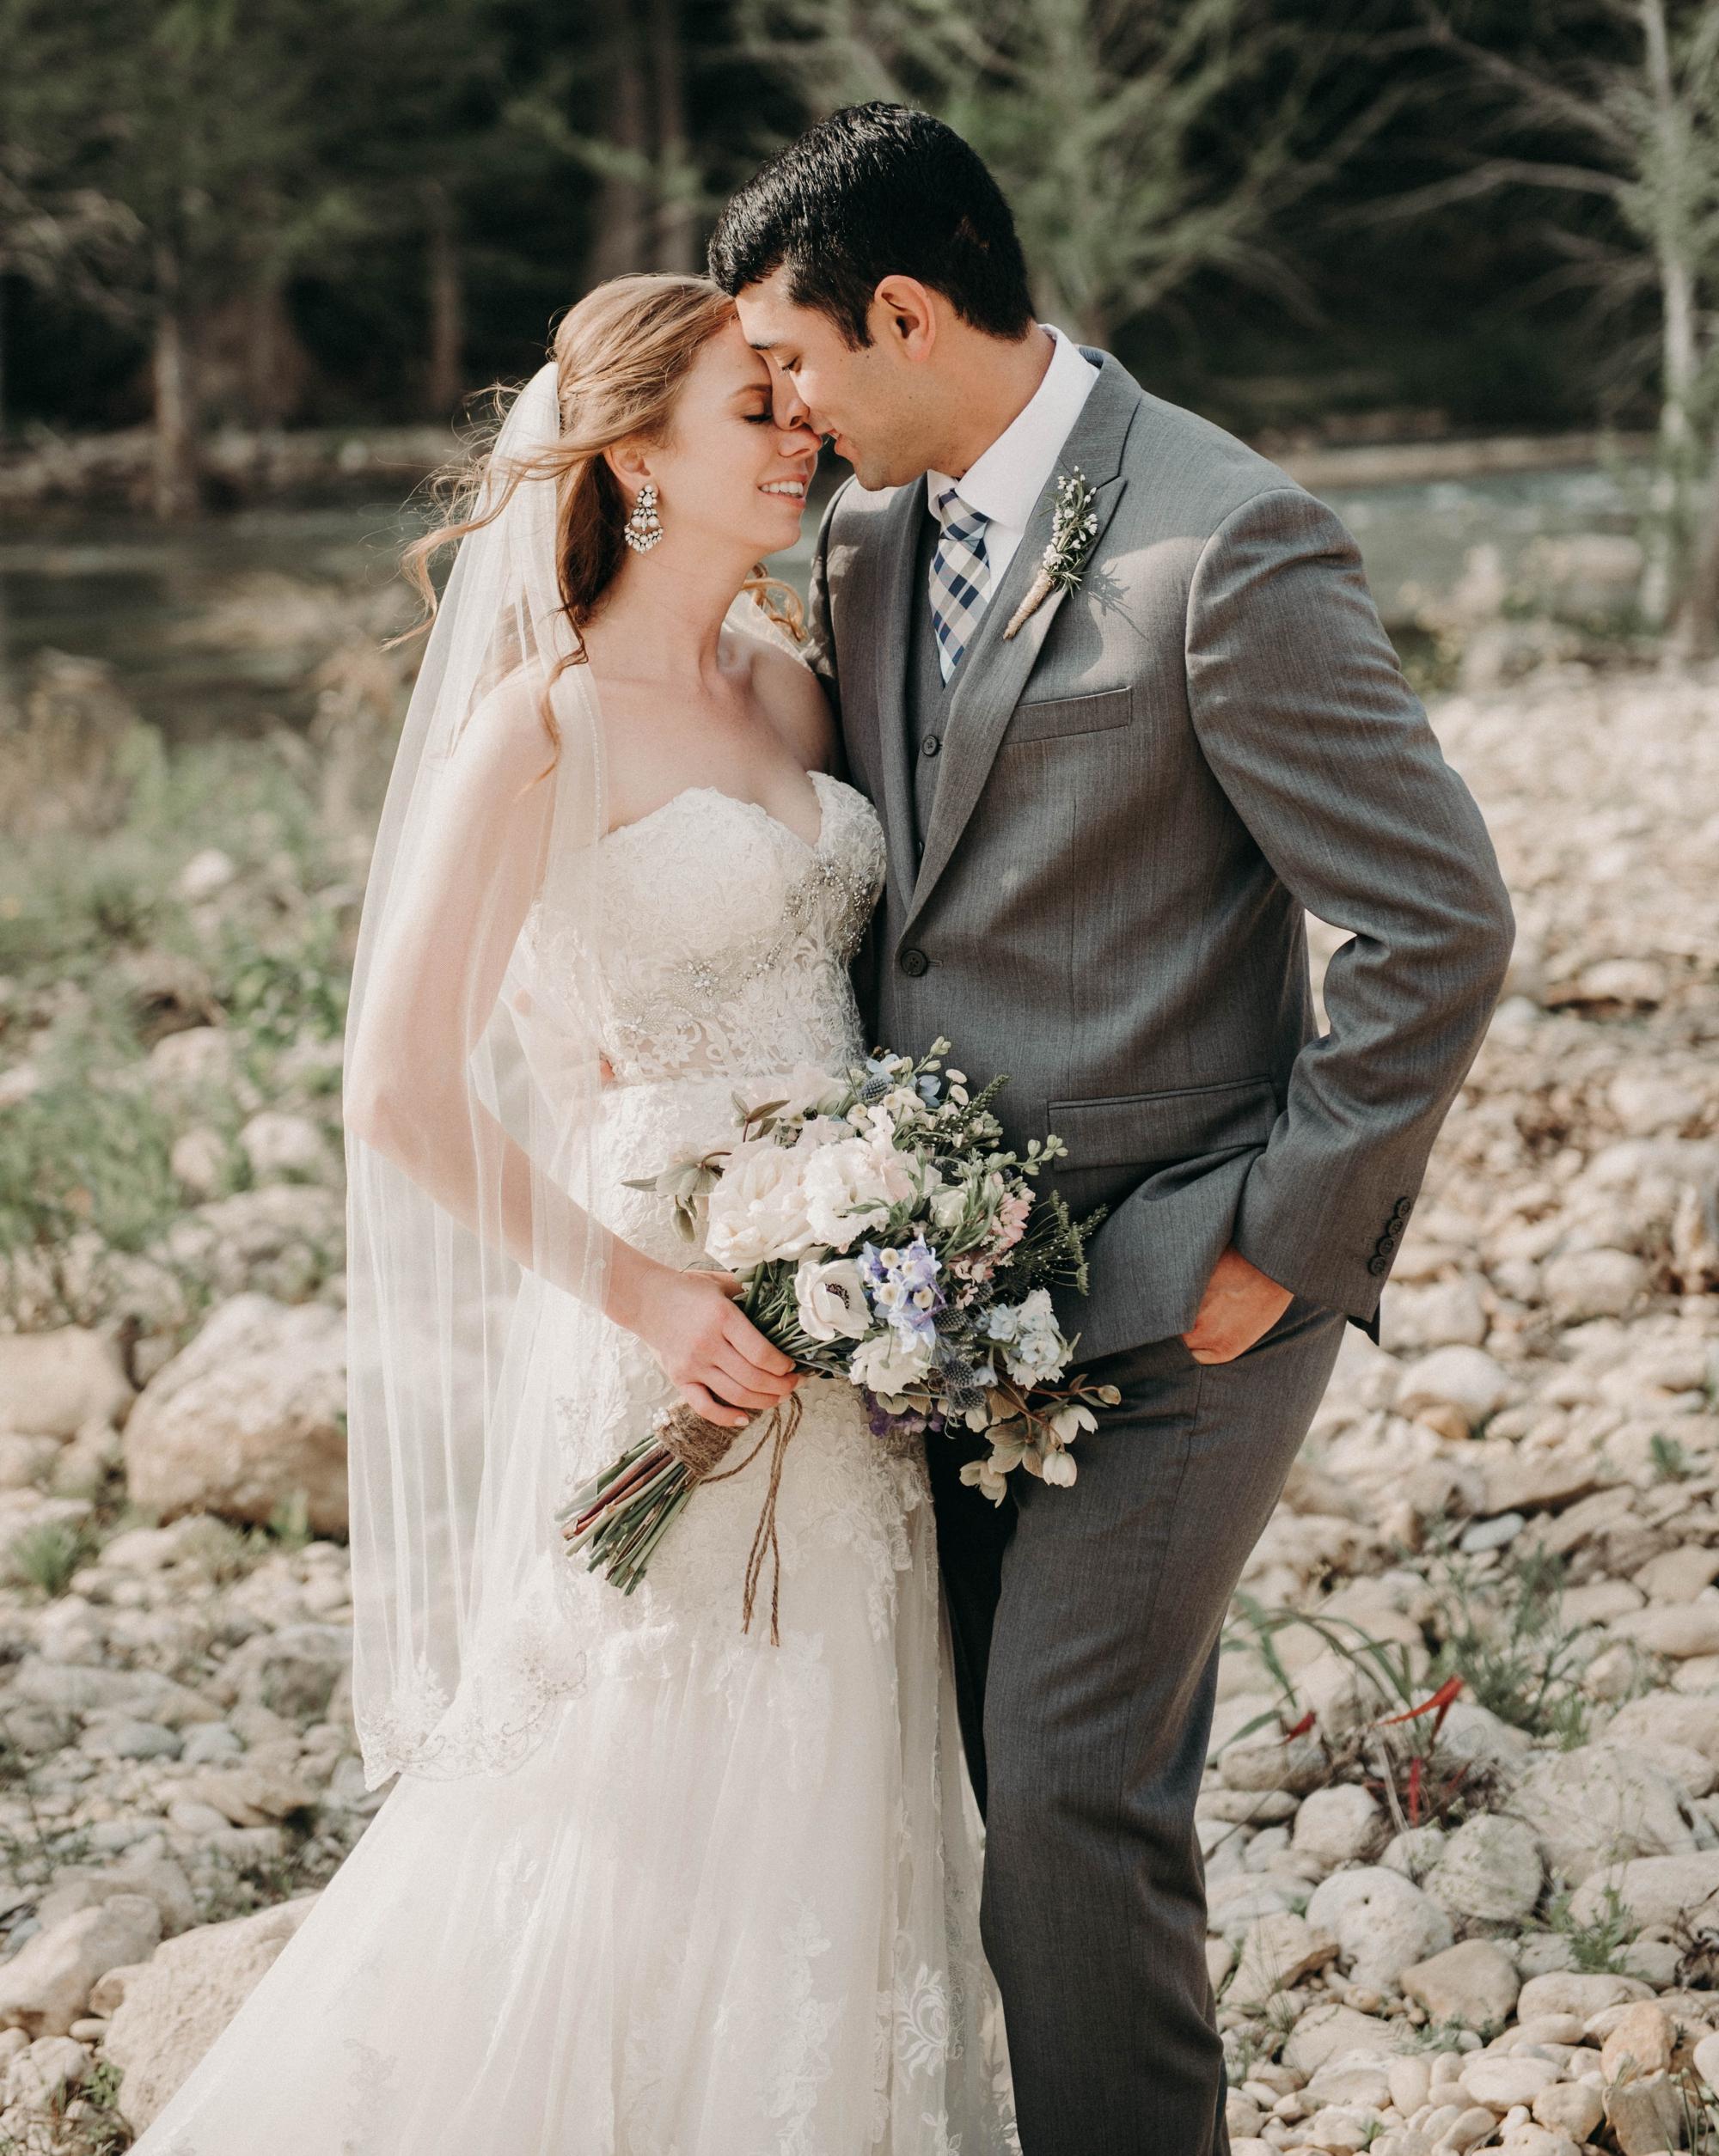 wimberley-texas-wedding-photography-1778-photographie-11.jpg